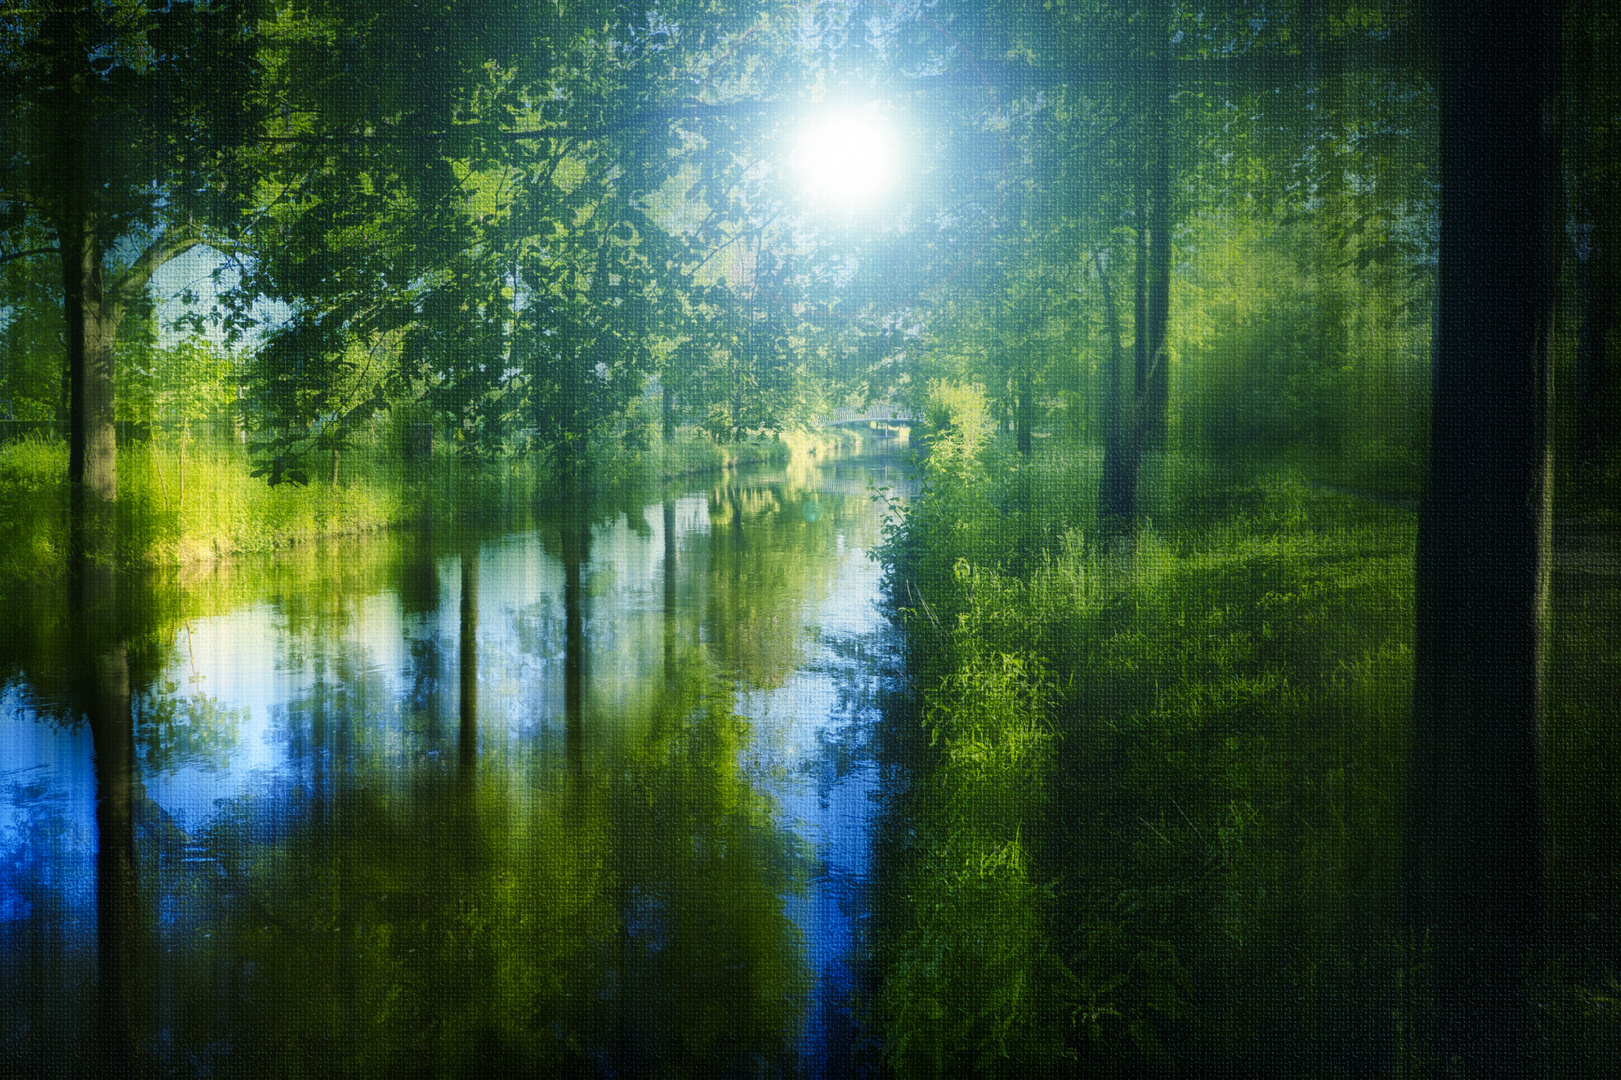 Unter dem Schatten der Bäume